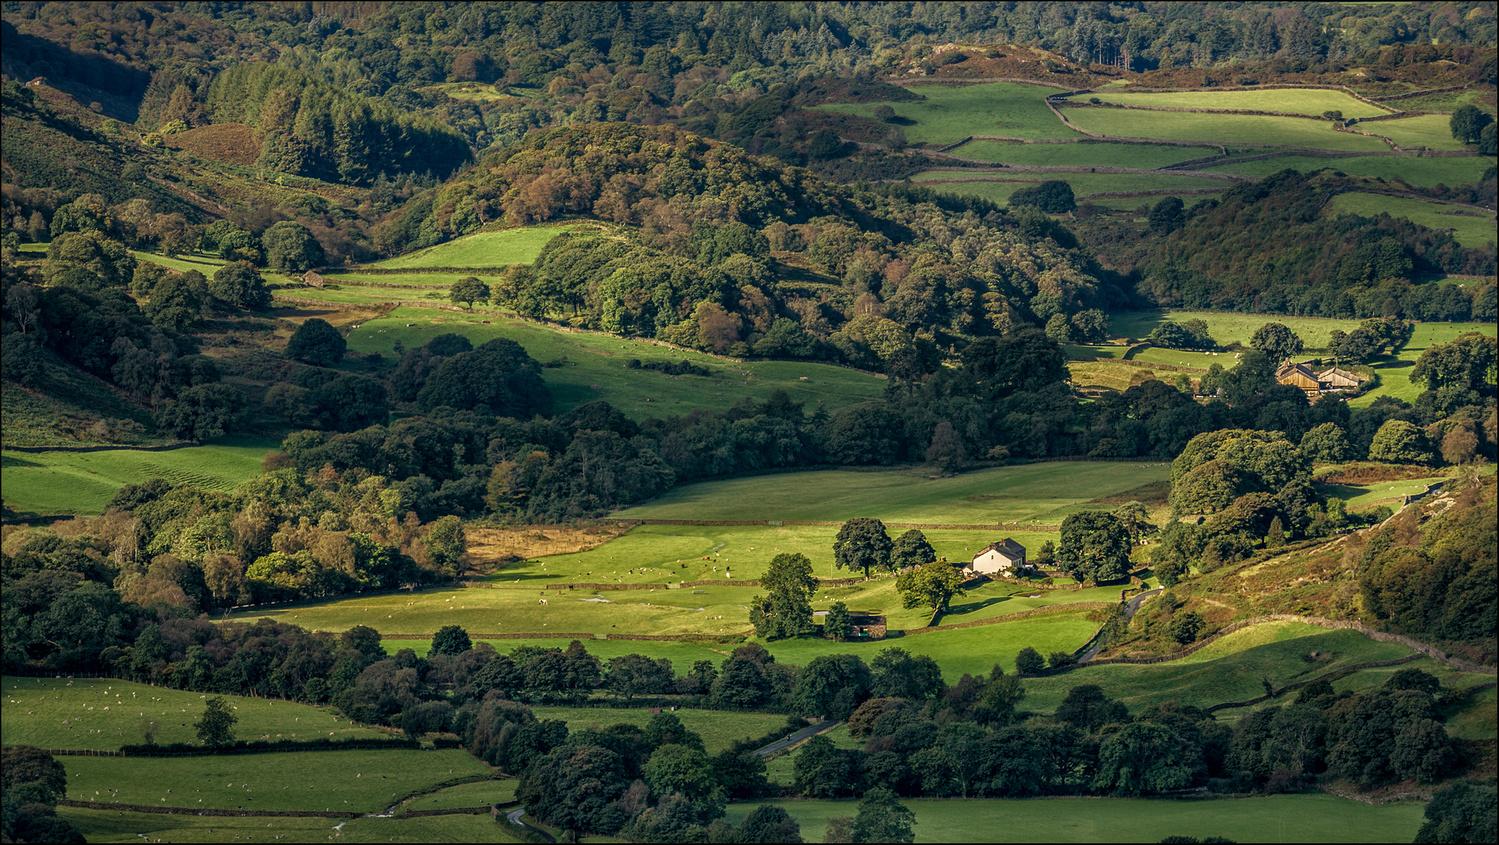 Morning light on Fell Foot Farm,Little Langdale, Cumbria by Mark Heavisides